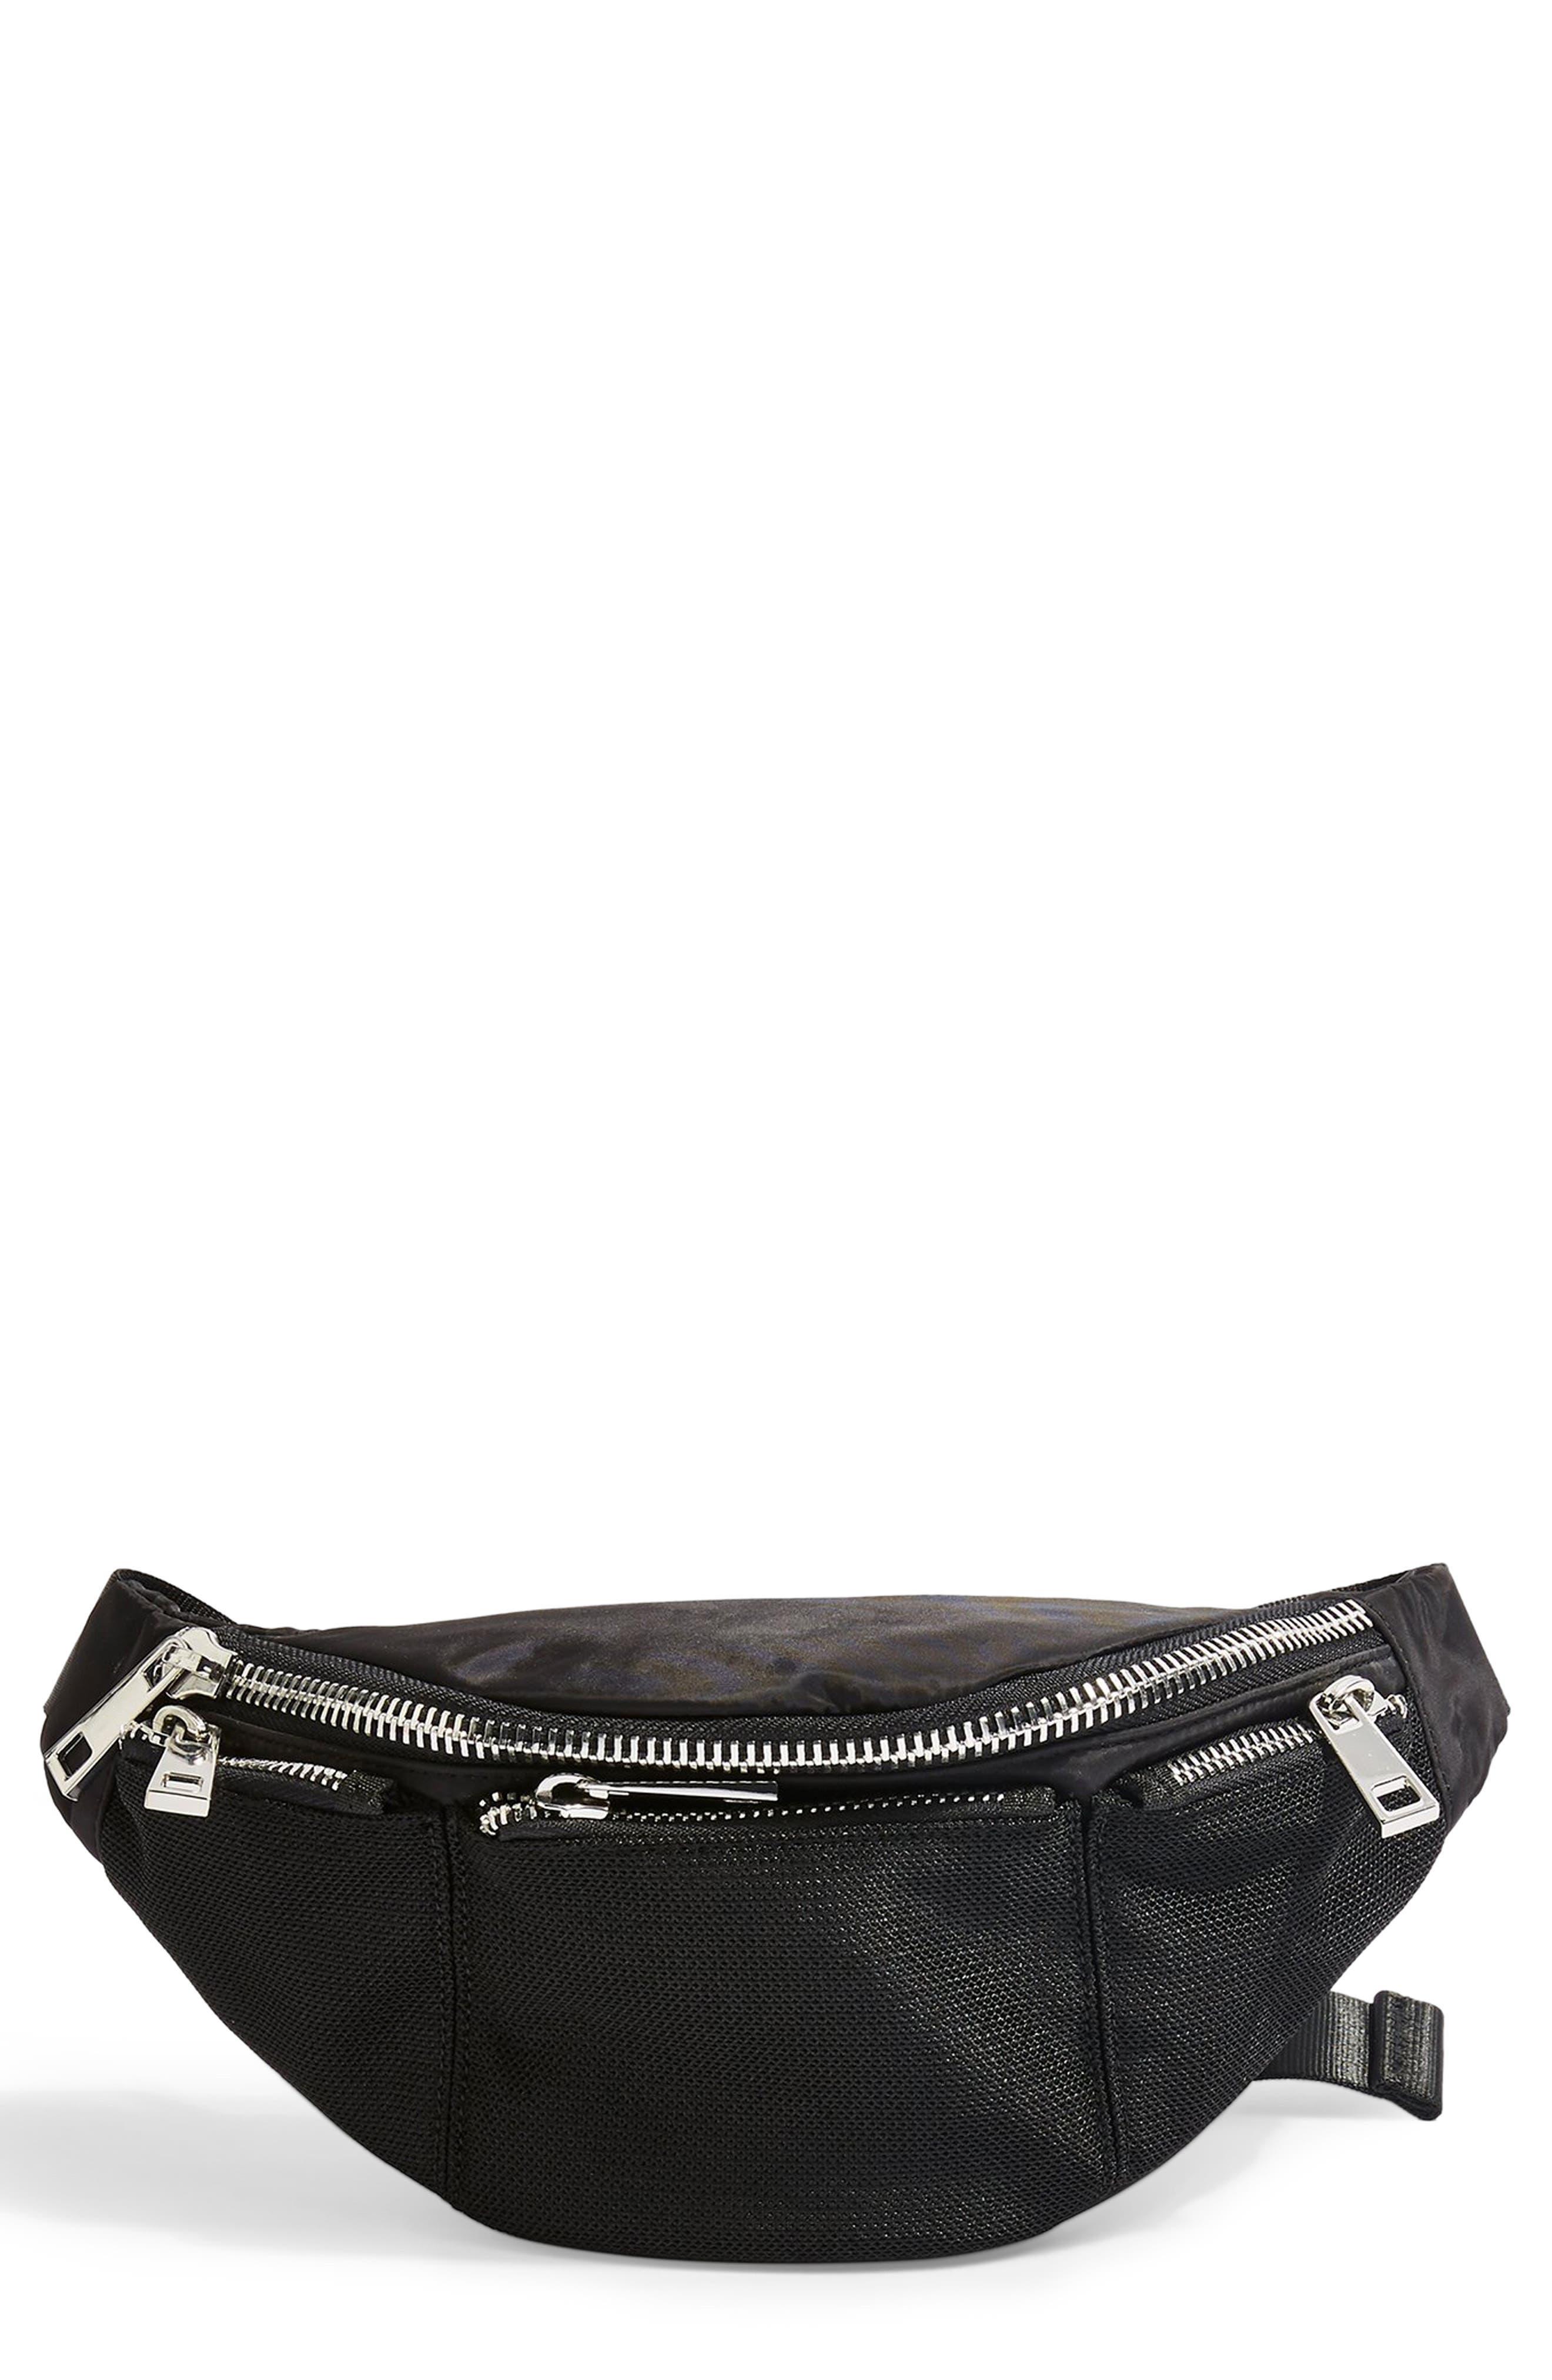 TOPSHOP, Warsaw Nylon Belt Bag, Main thumbnail 1, color, BLACK